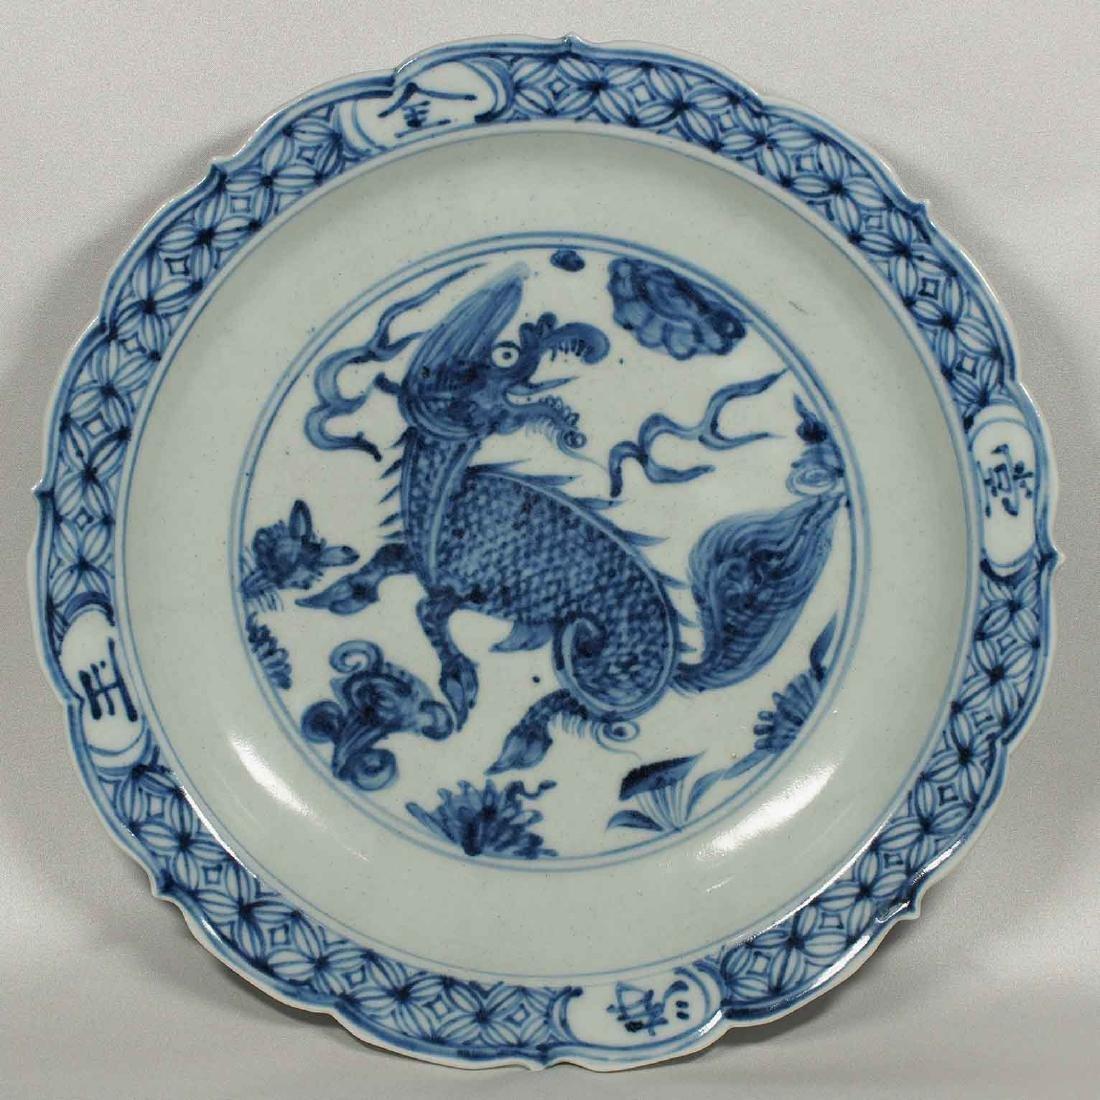 Plate with Qilin Design, Hongzhi-Zhengde, Ming Dynasty